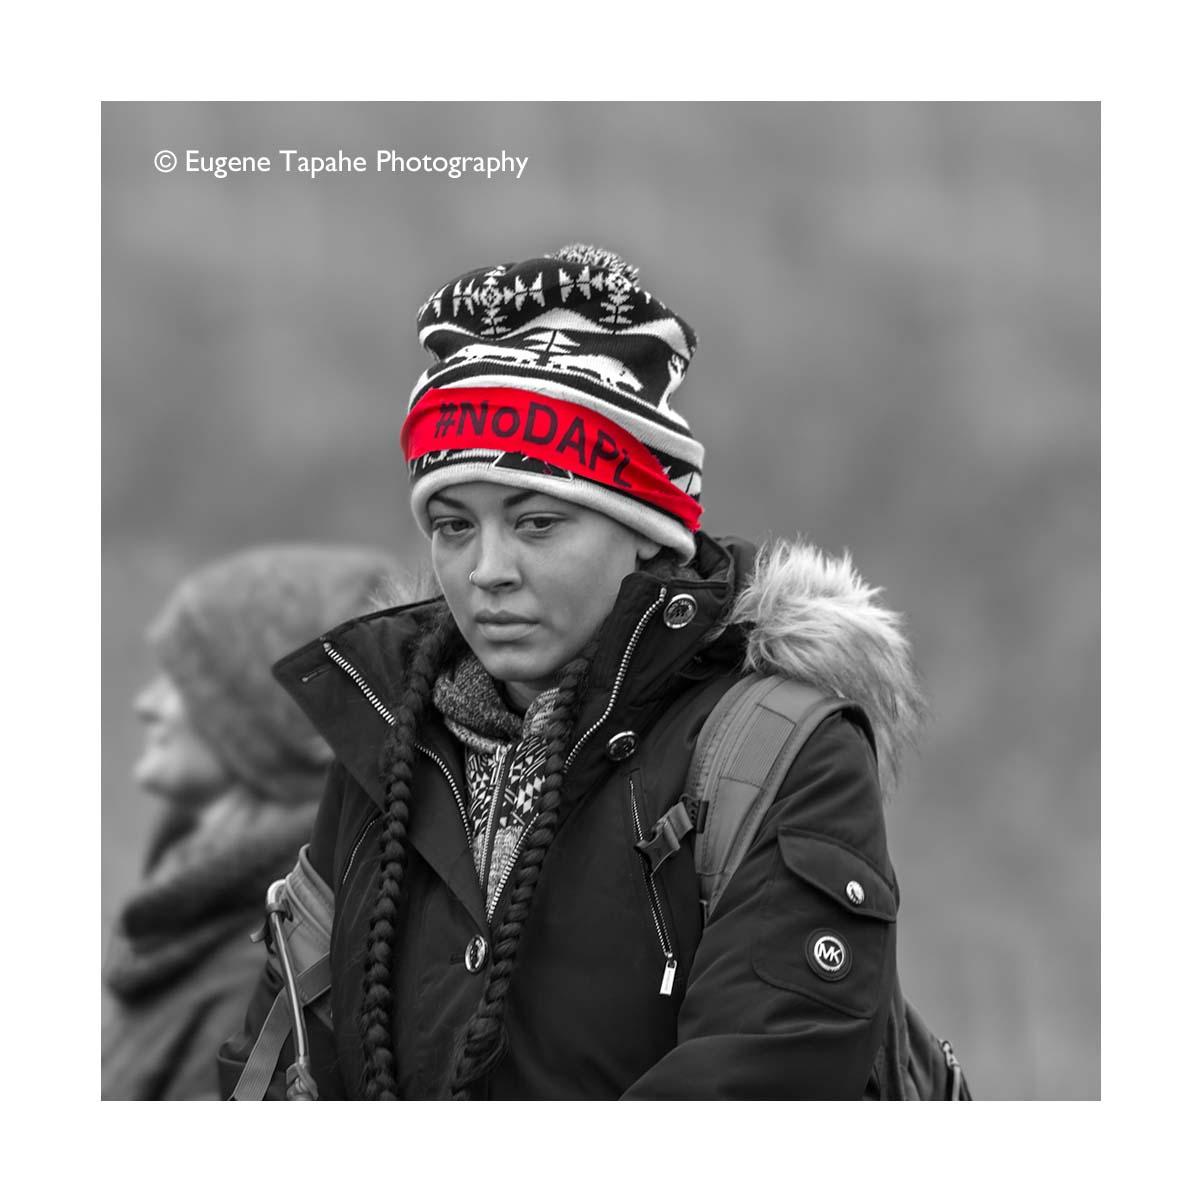 #NoDAPL photograph ©Eugene Tapahe